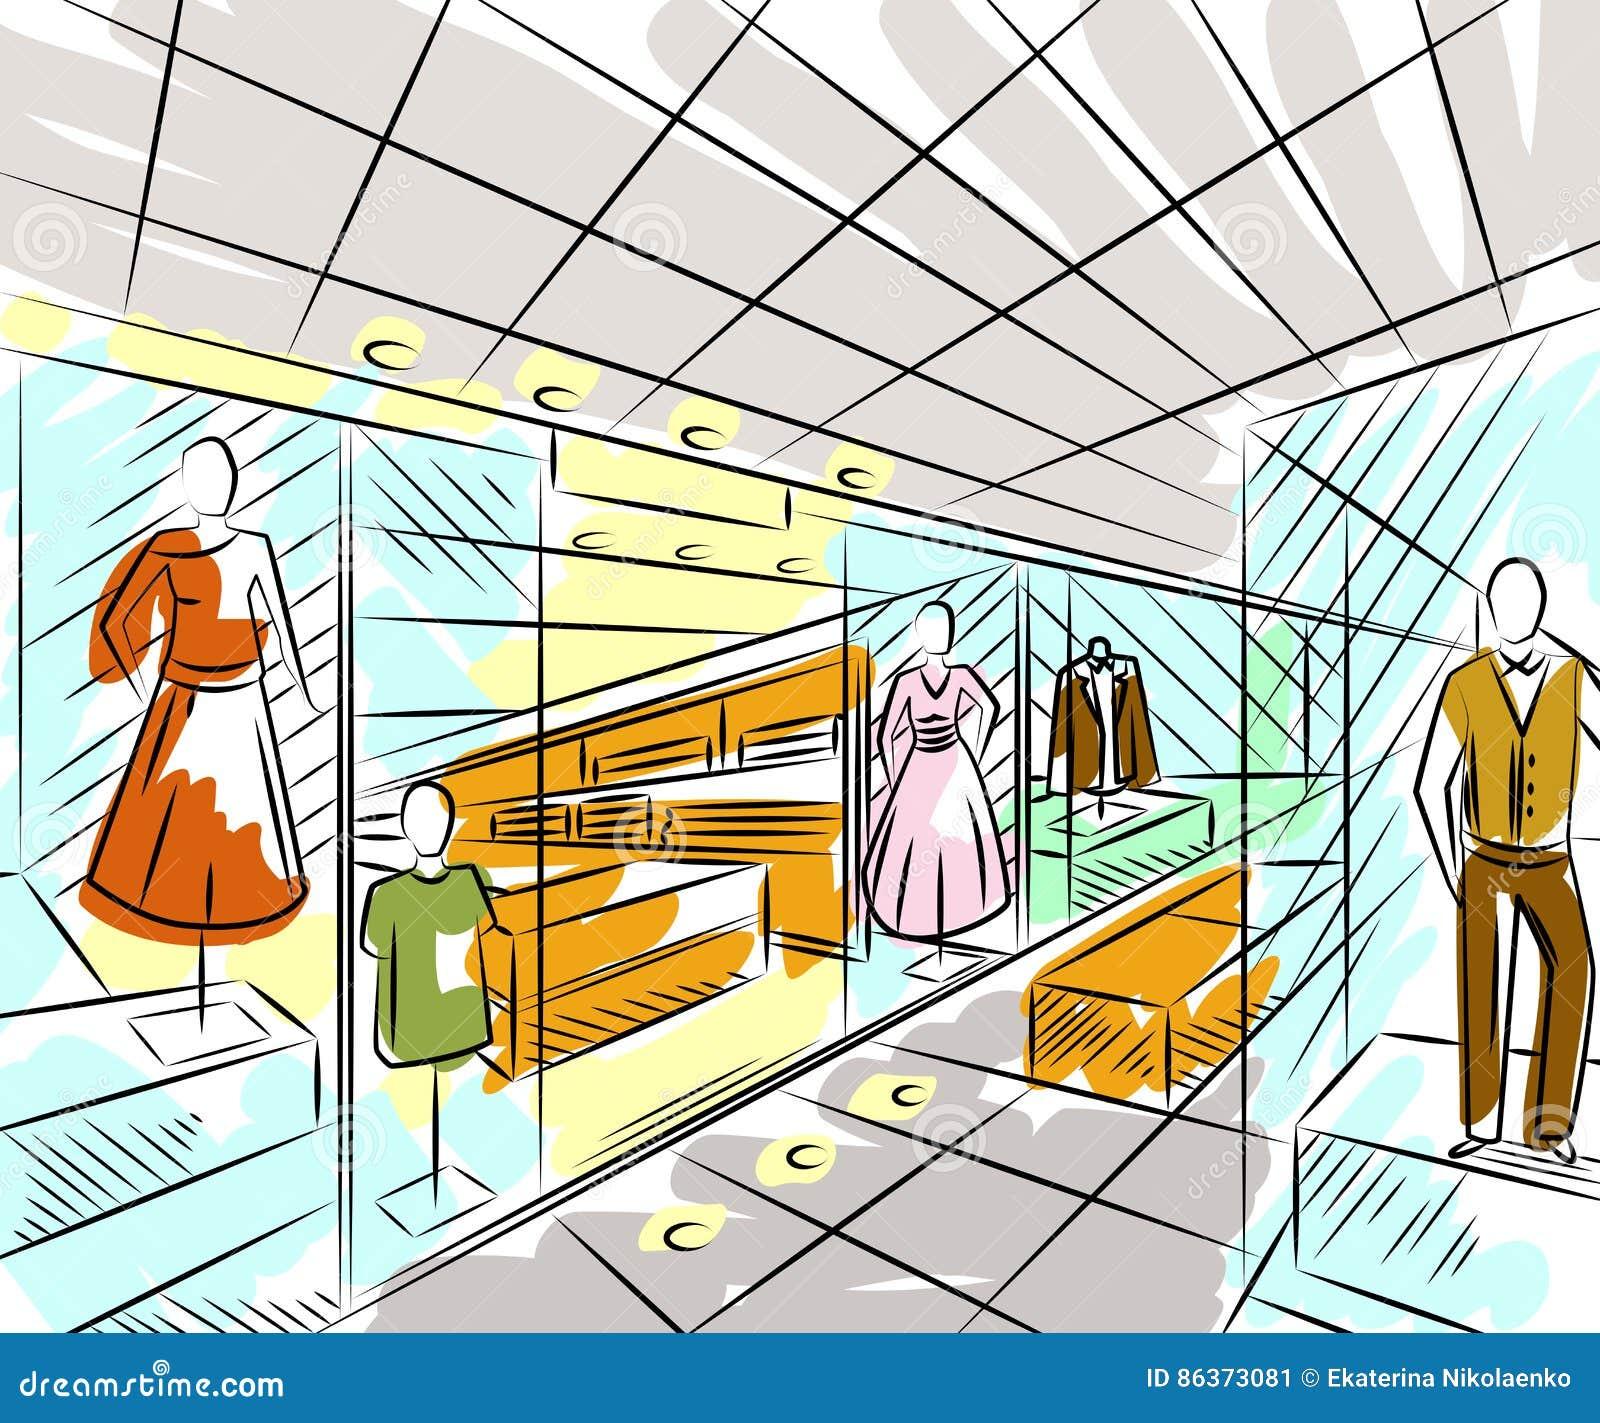 interior design in sketch style